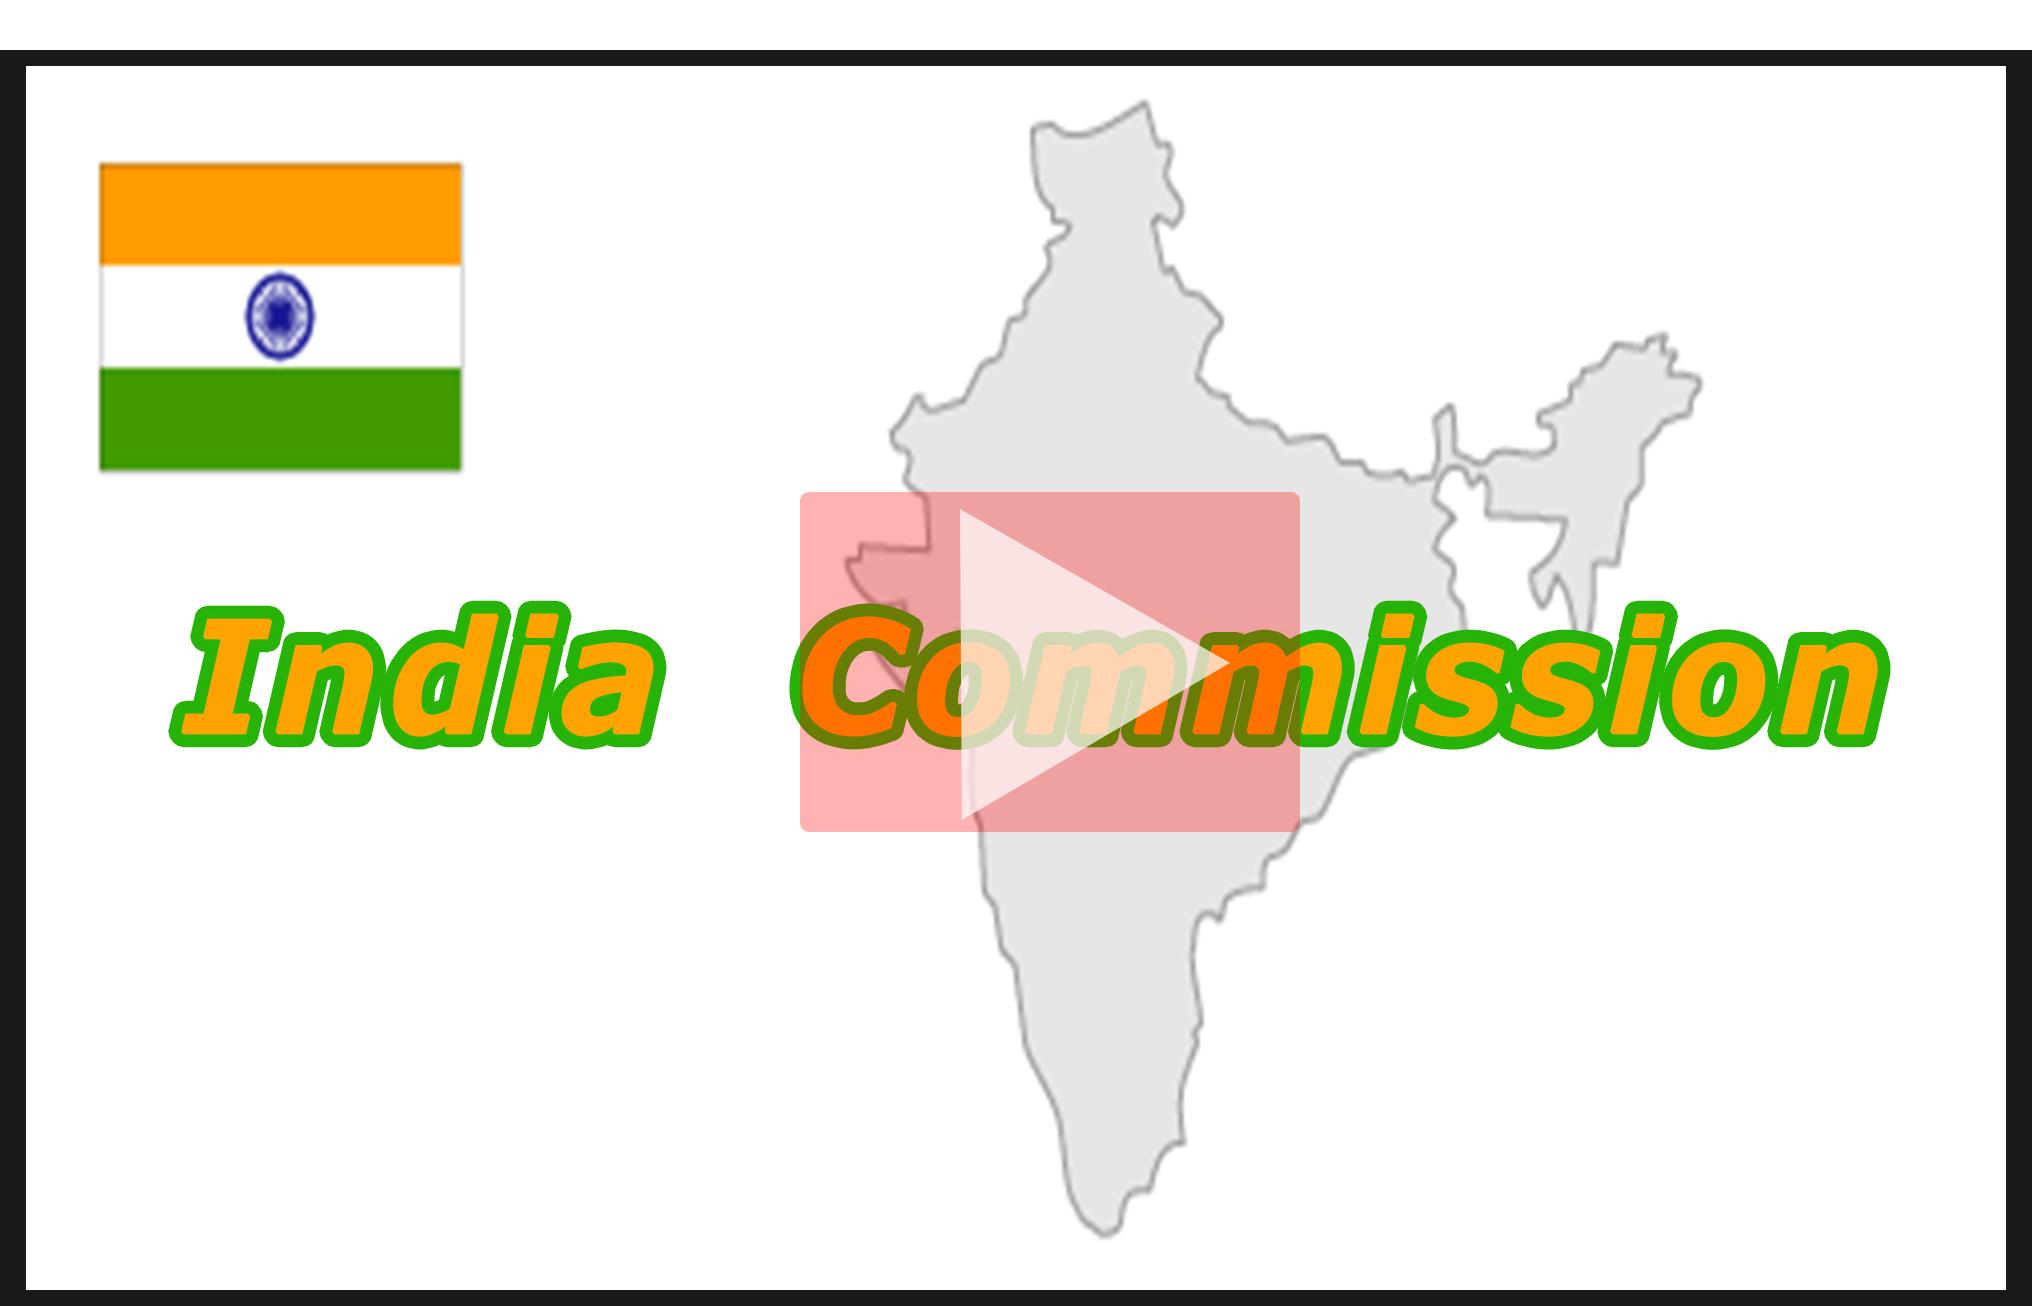 India-commission